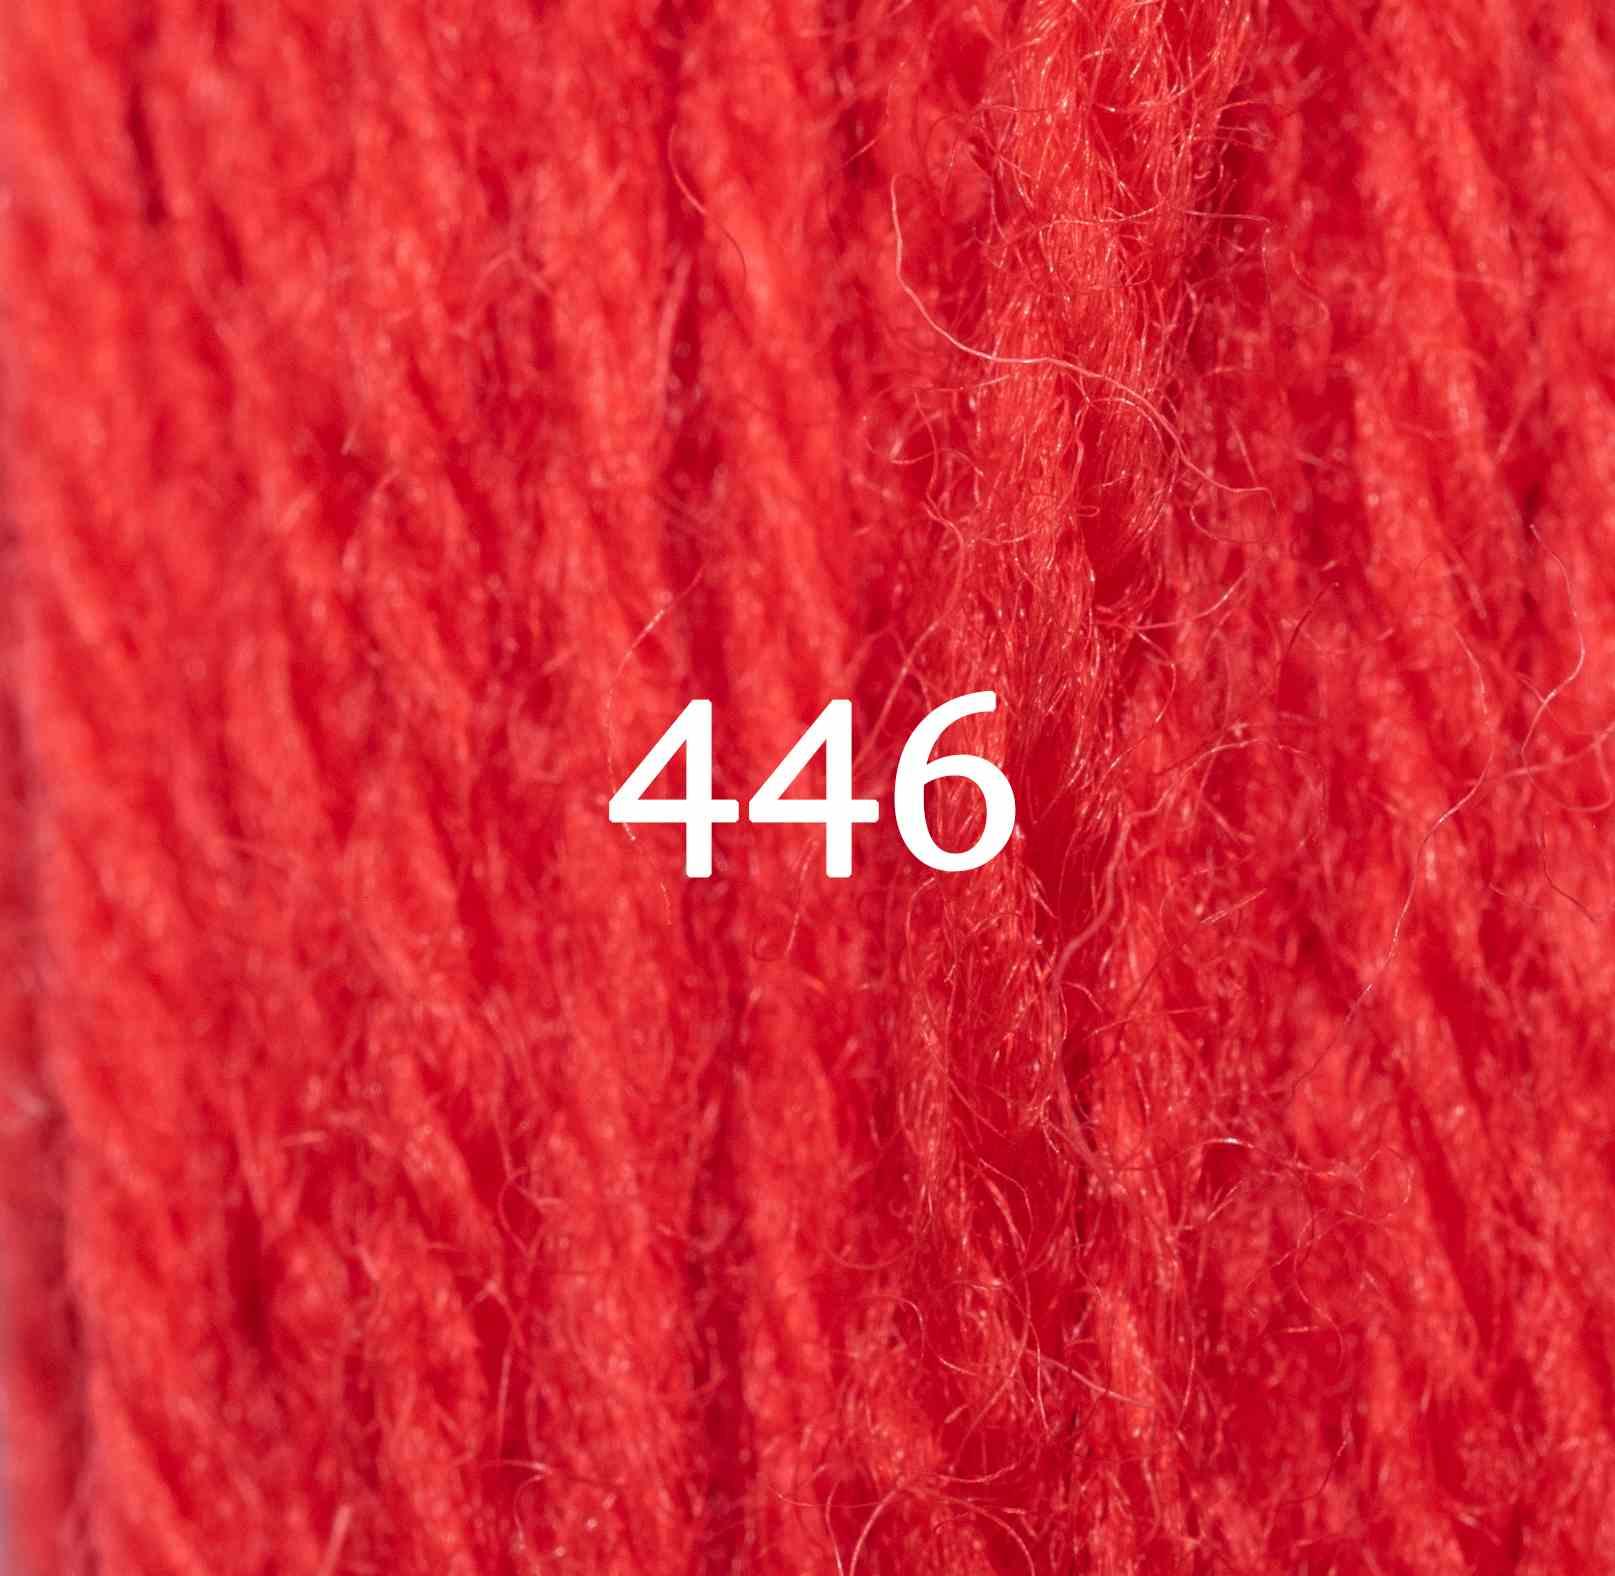 Orange-Red-446